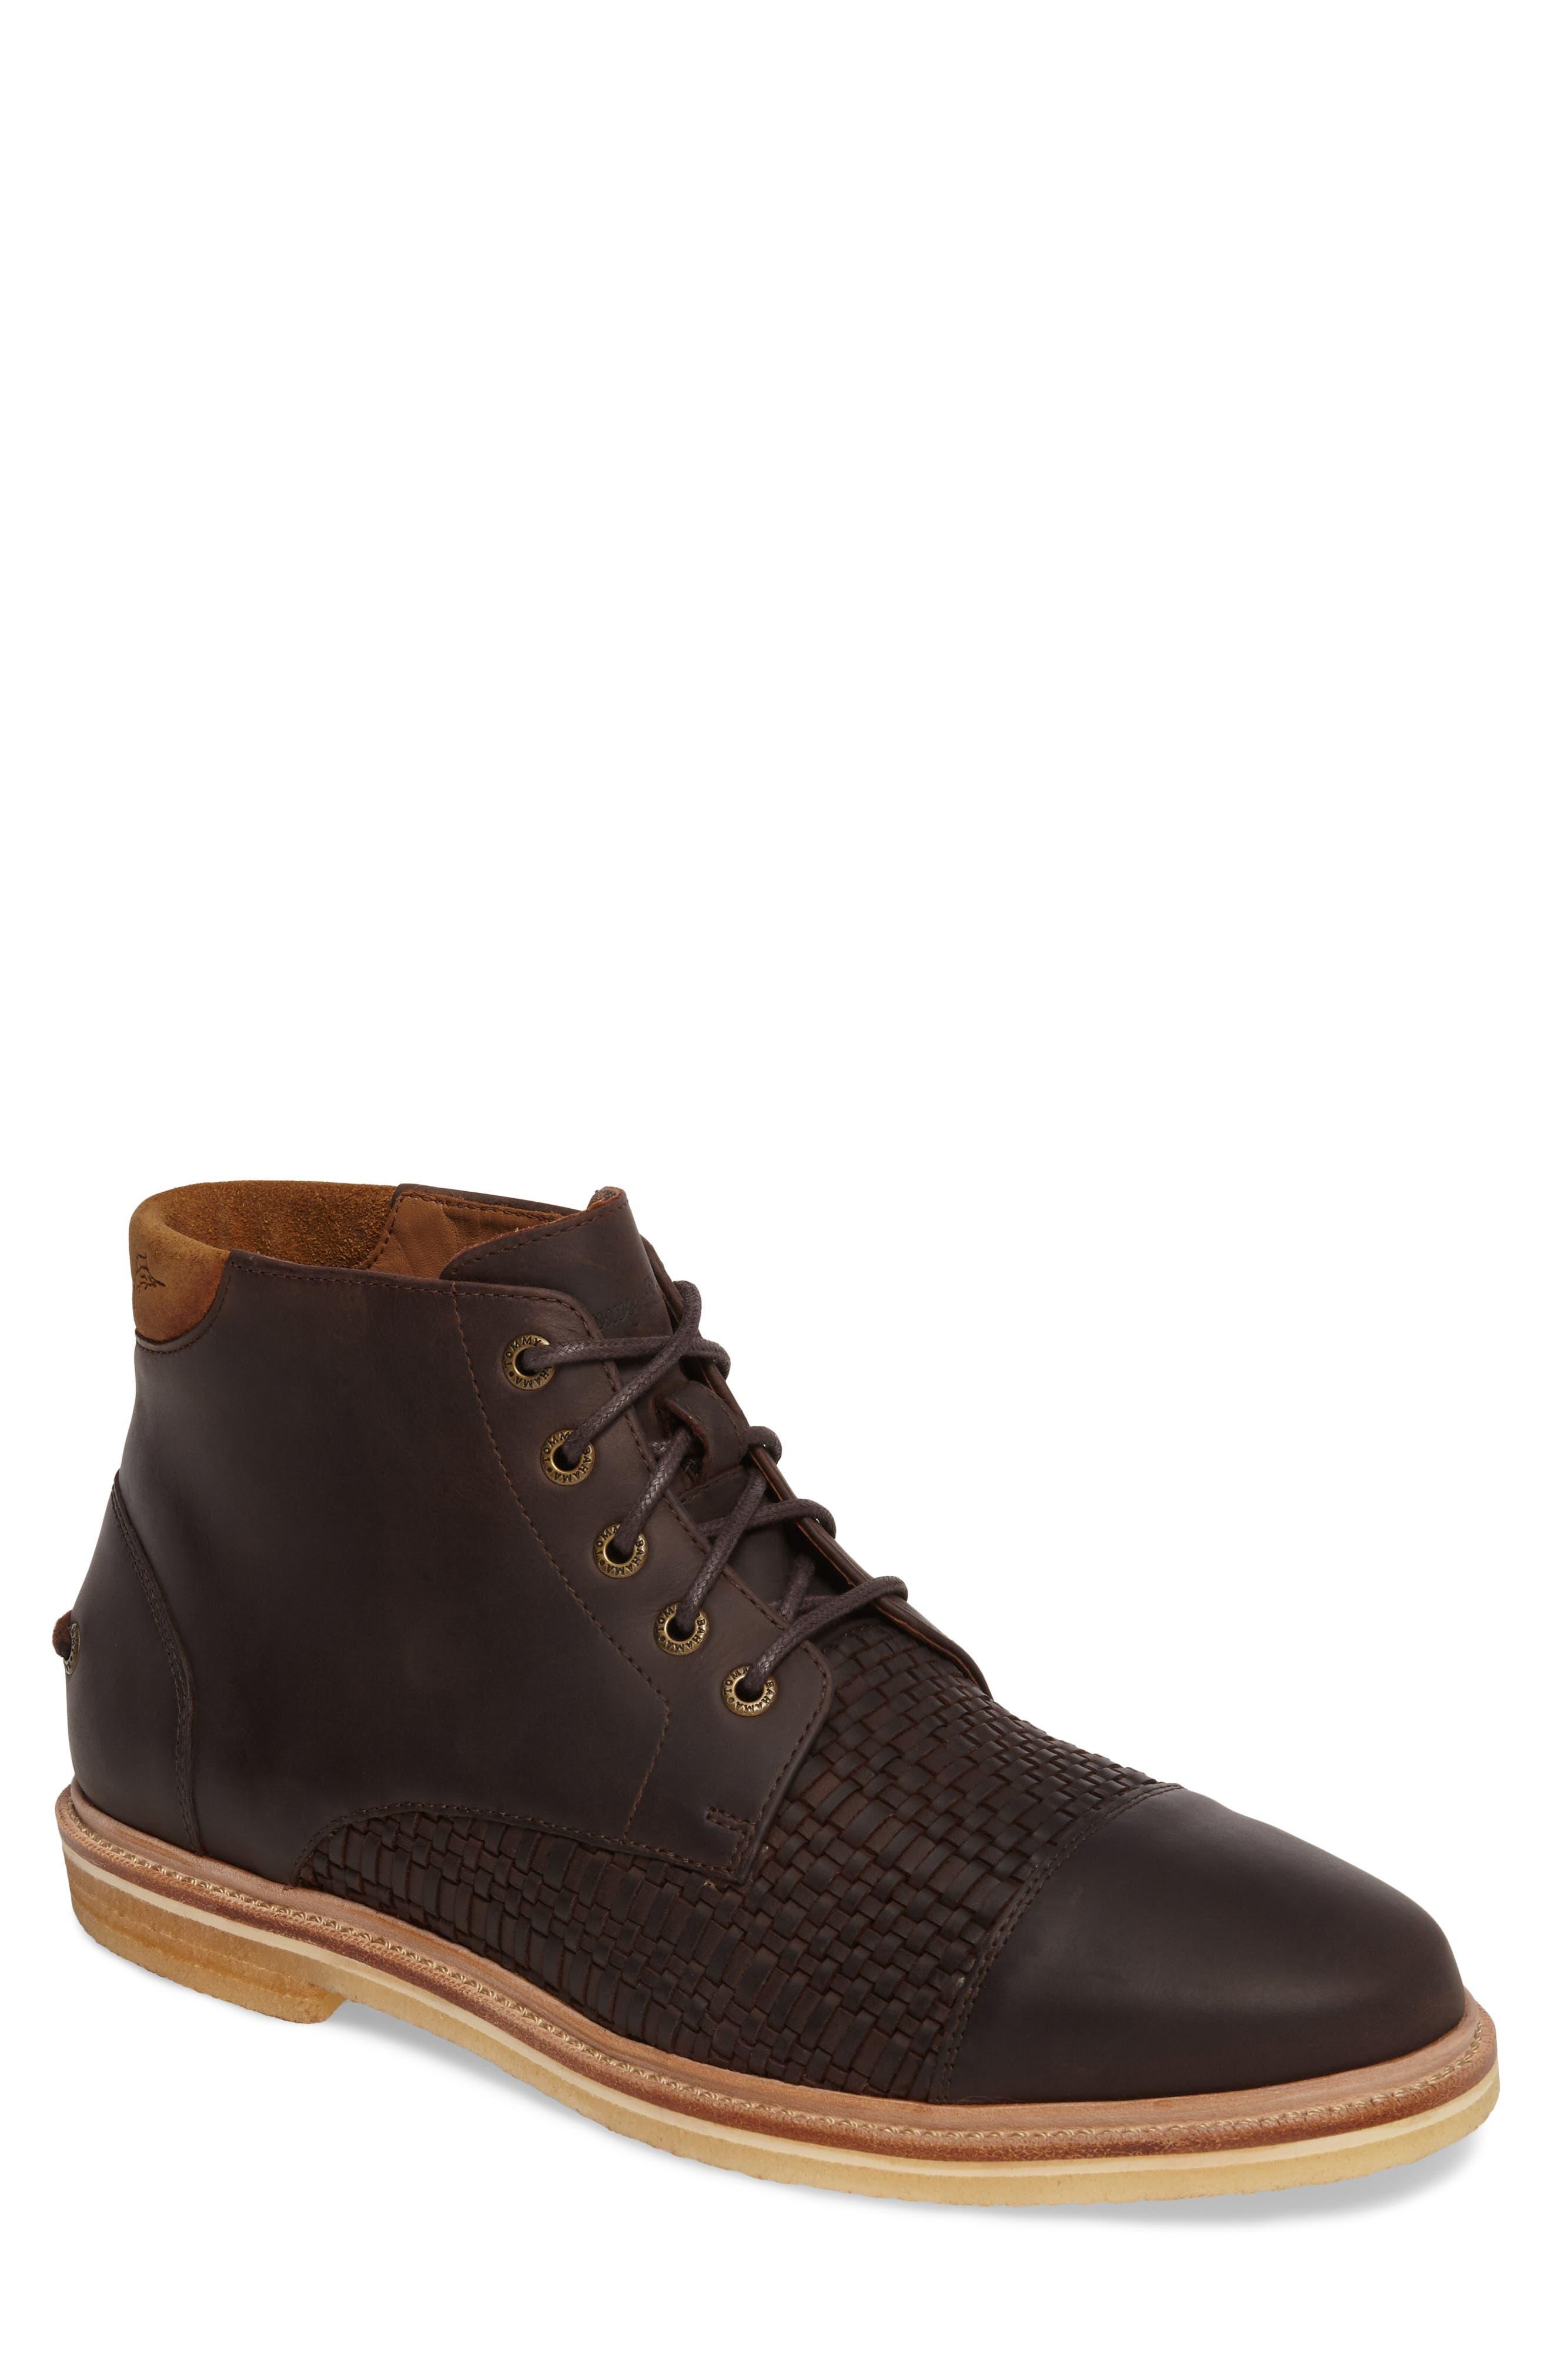 Argon Blooms Cap Toe Boot,                             Main thumbnail 1, color,                             Brown Leather